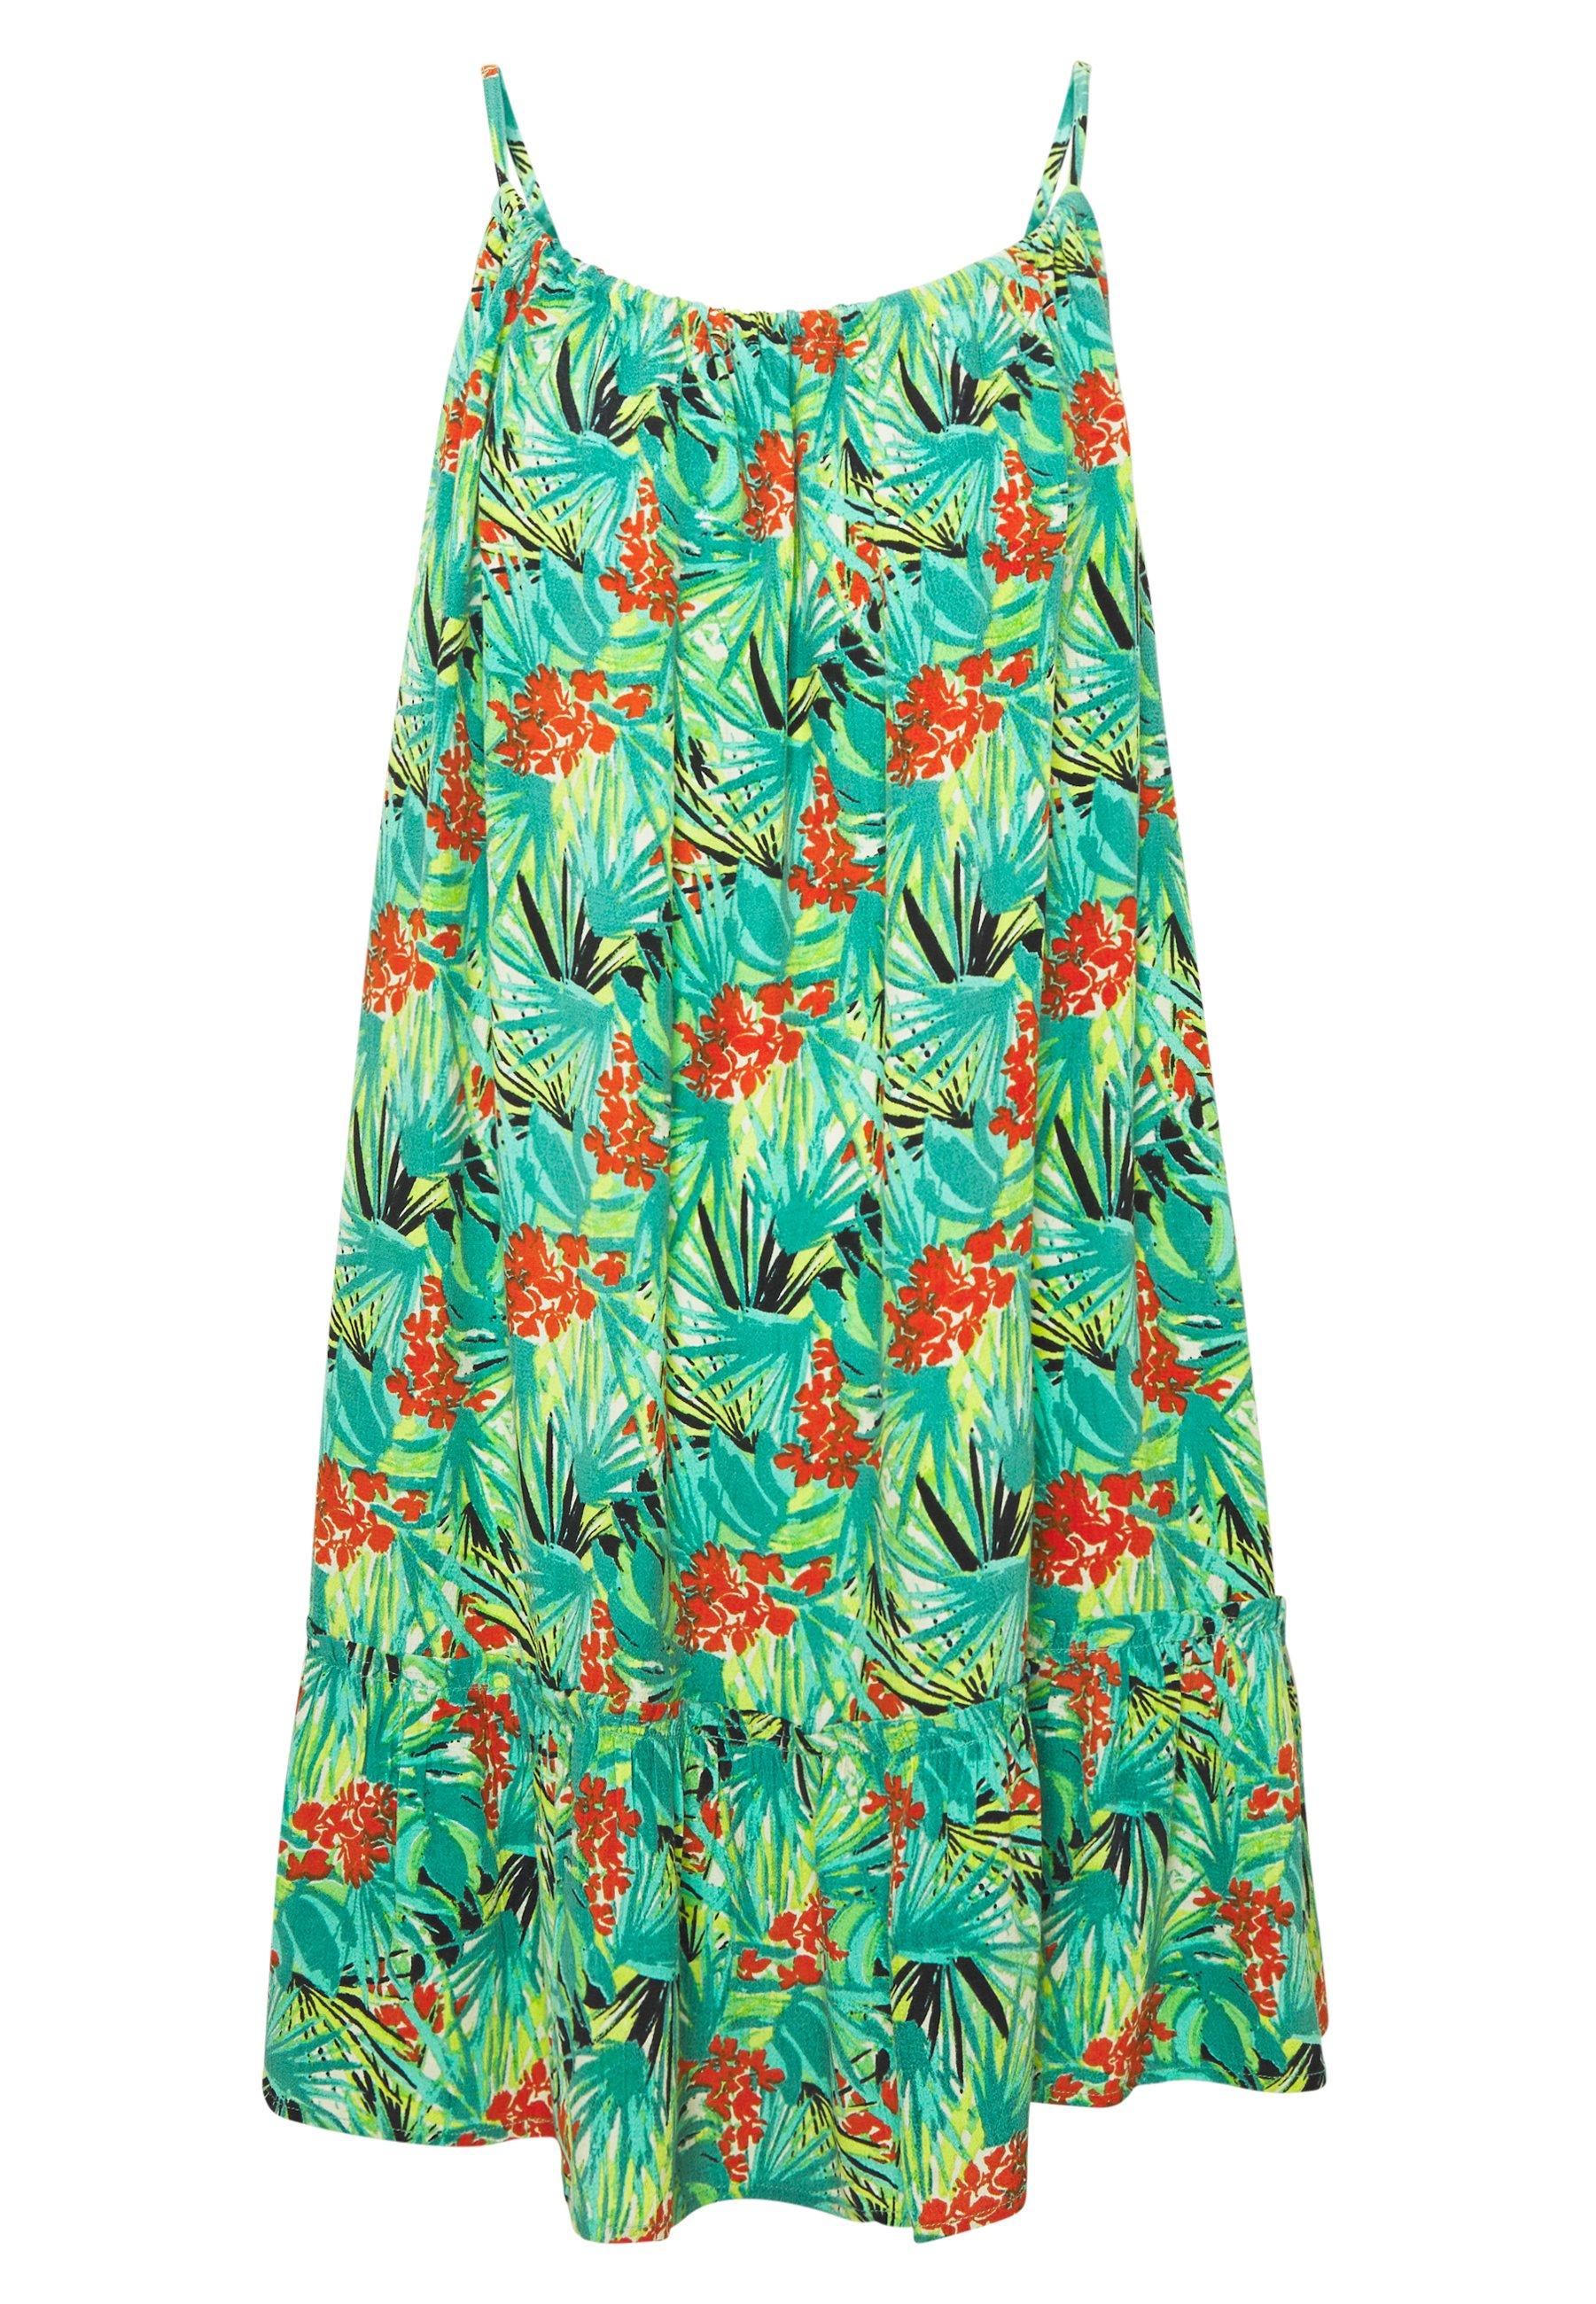 Superdry Daisy Beach Dress - Vestito Estivo Yellow Floral xVtEp